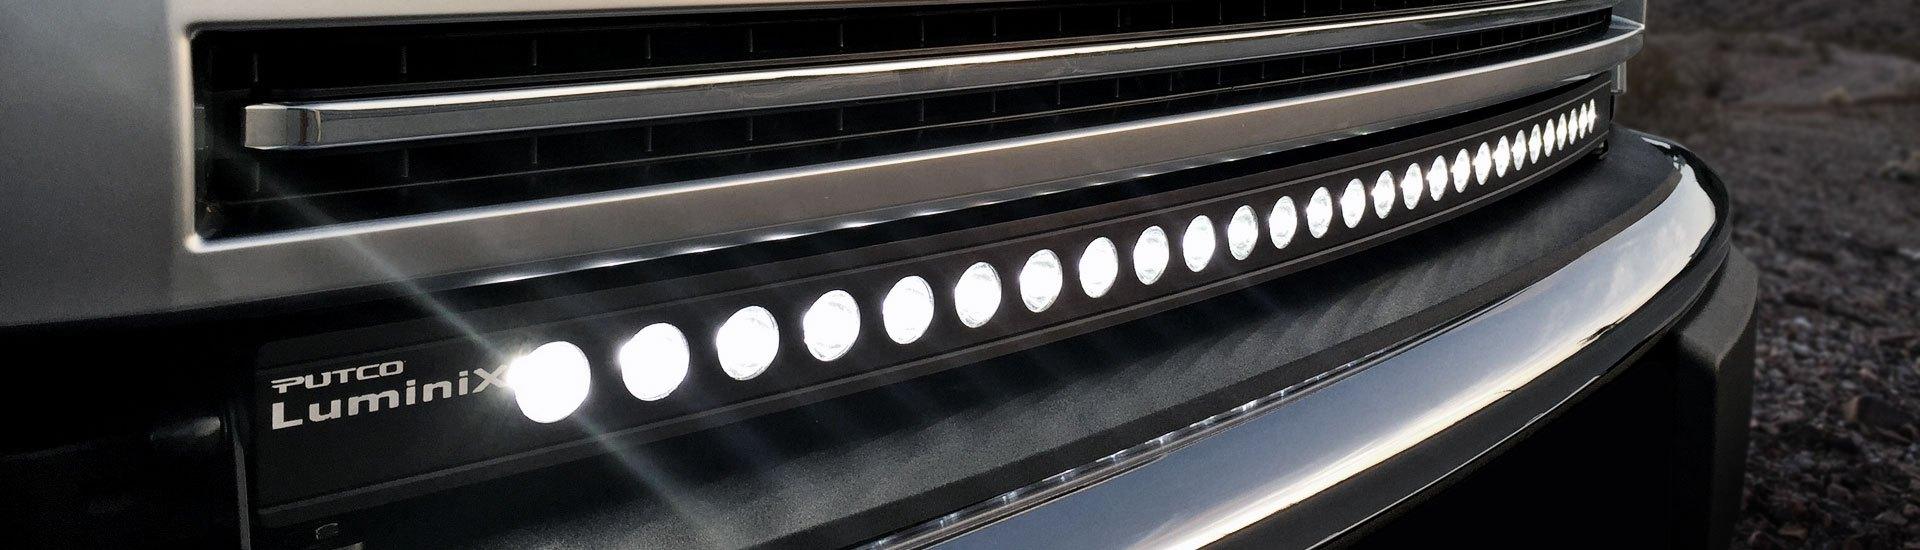 Off Road Lights Led Hid Fog Driving Light Bars 2015 Honda Pilot Trailer Wiring Harness